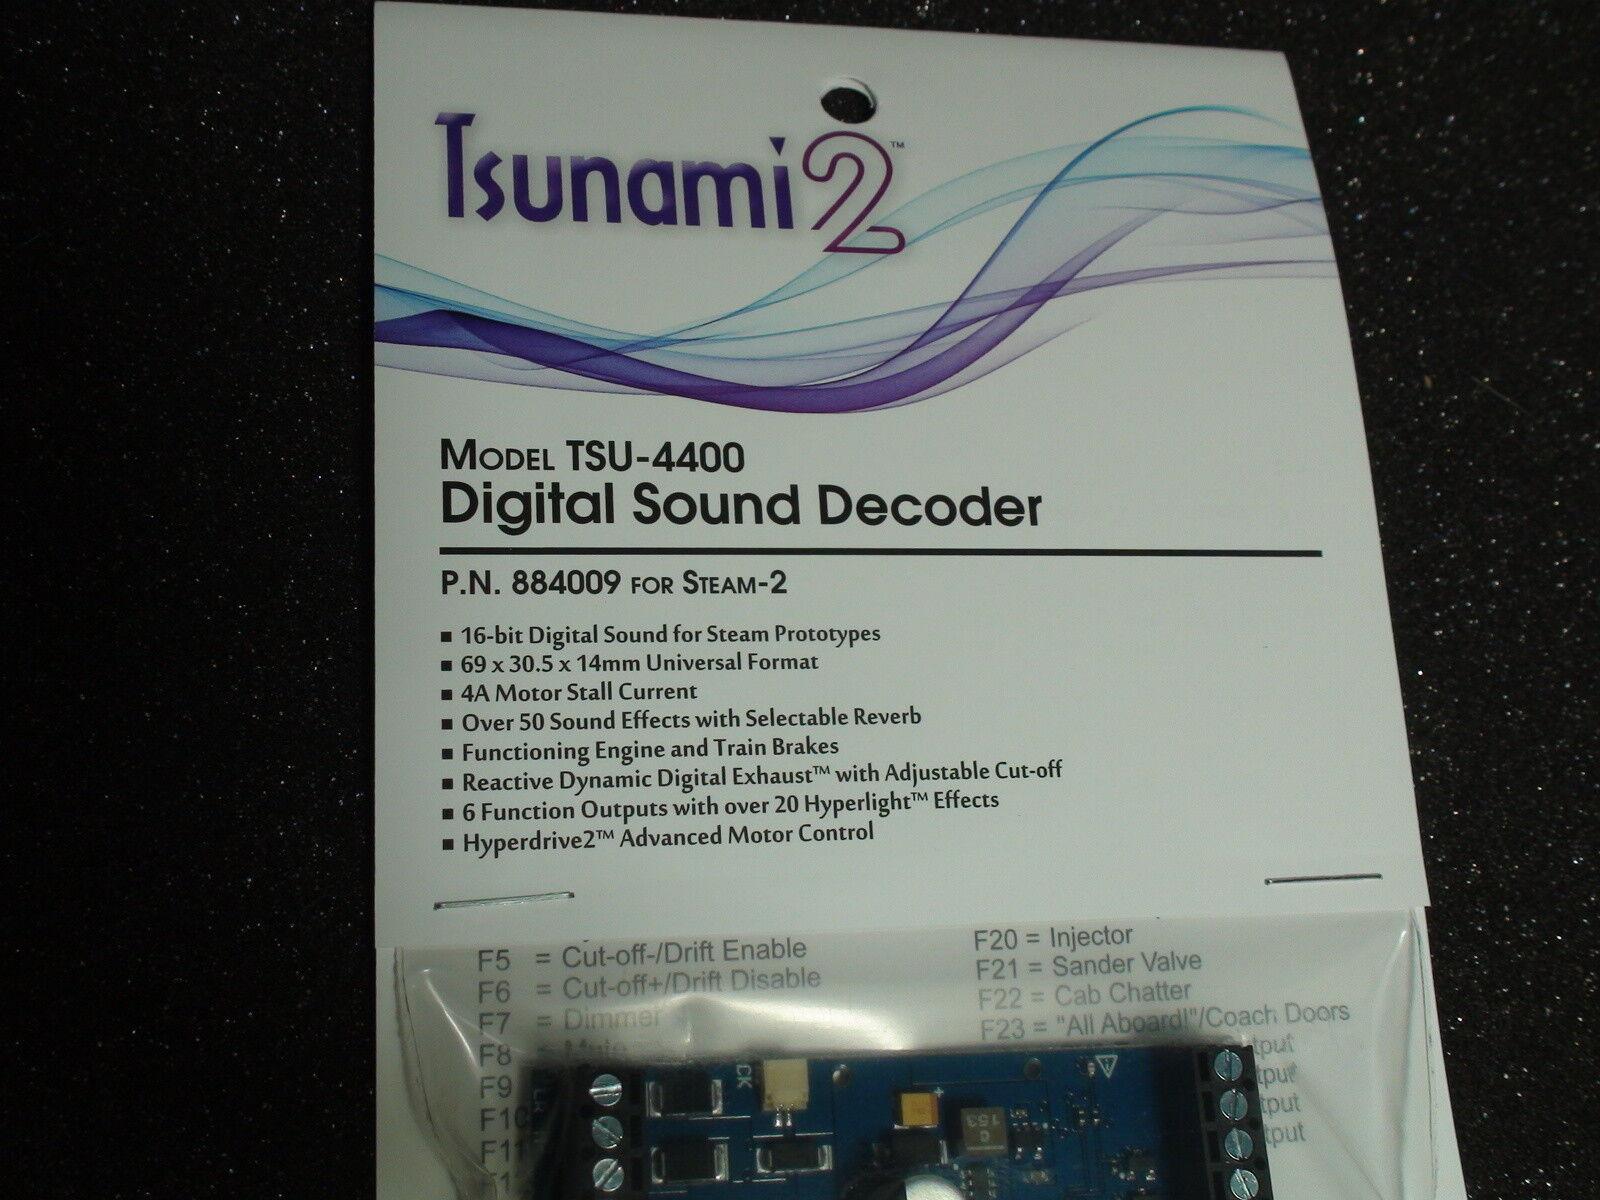 TSUNAMI 2 TSU-4400 P.N.884009 STEAM-2 DIGITAL SOUND DECODER BIGDISCOUNTTRAINS